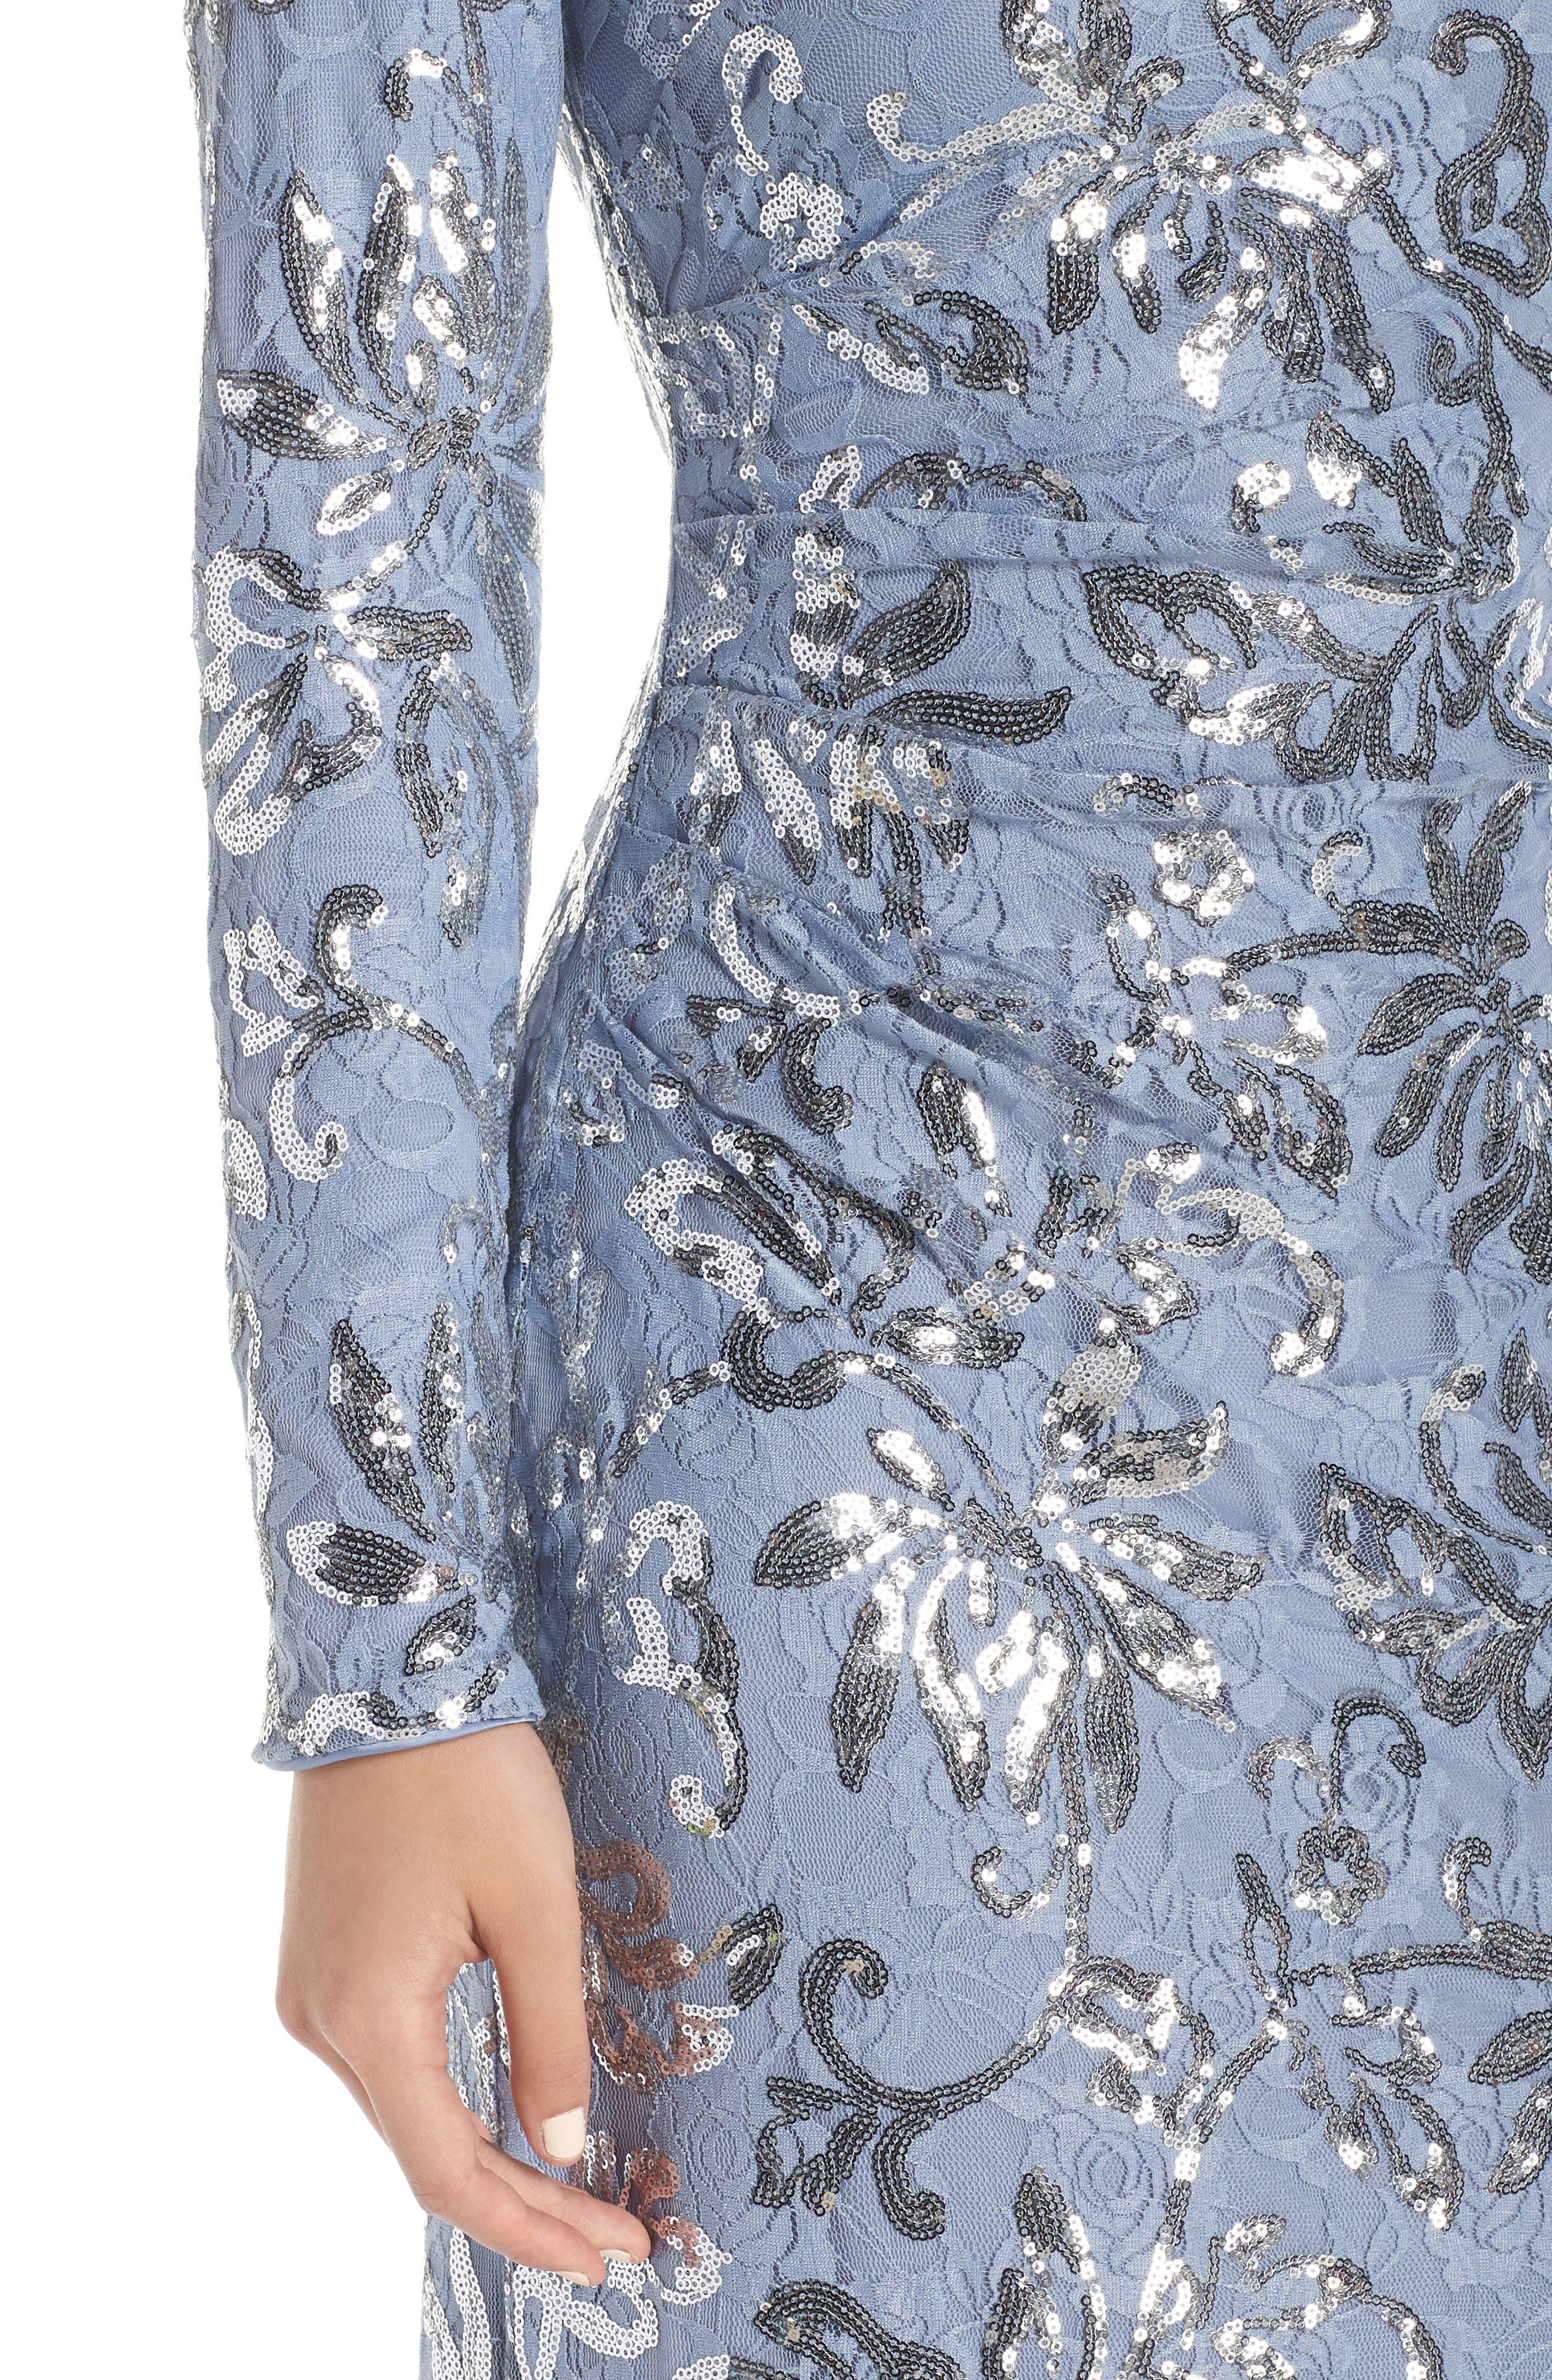 VINCE CAMUTO, Lace & Sequin Evening Dress, Alternate thumbnail 5, color, SKY BLUE